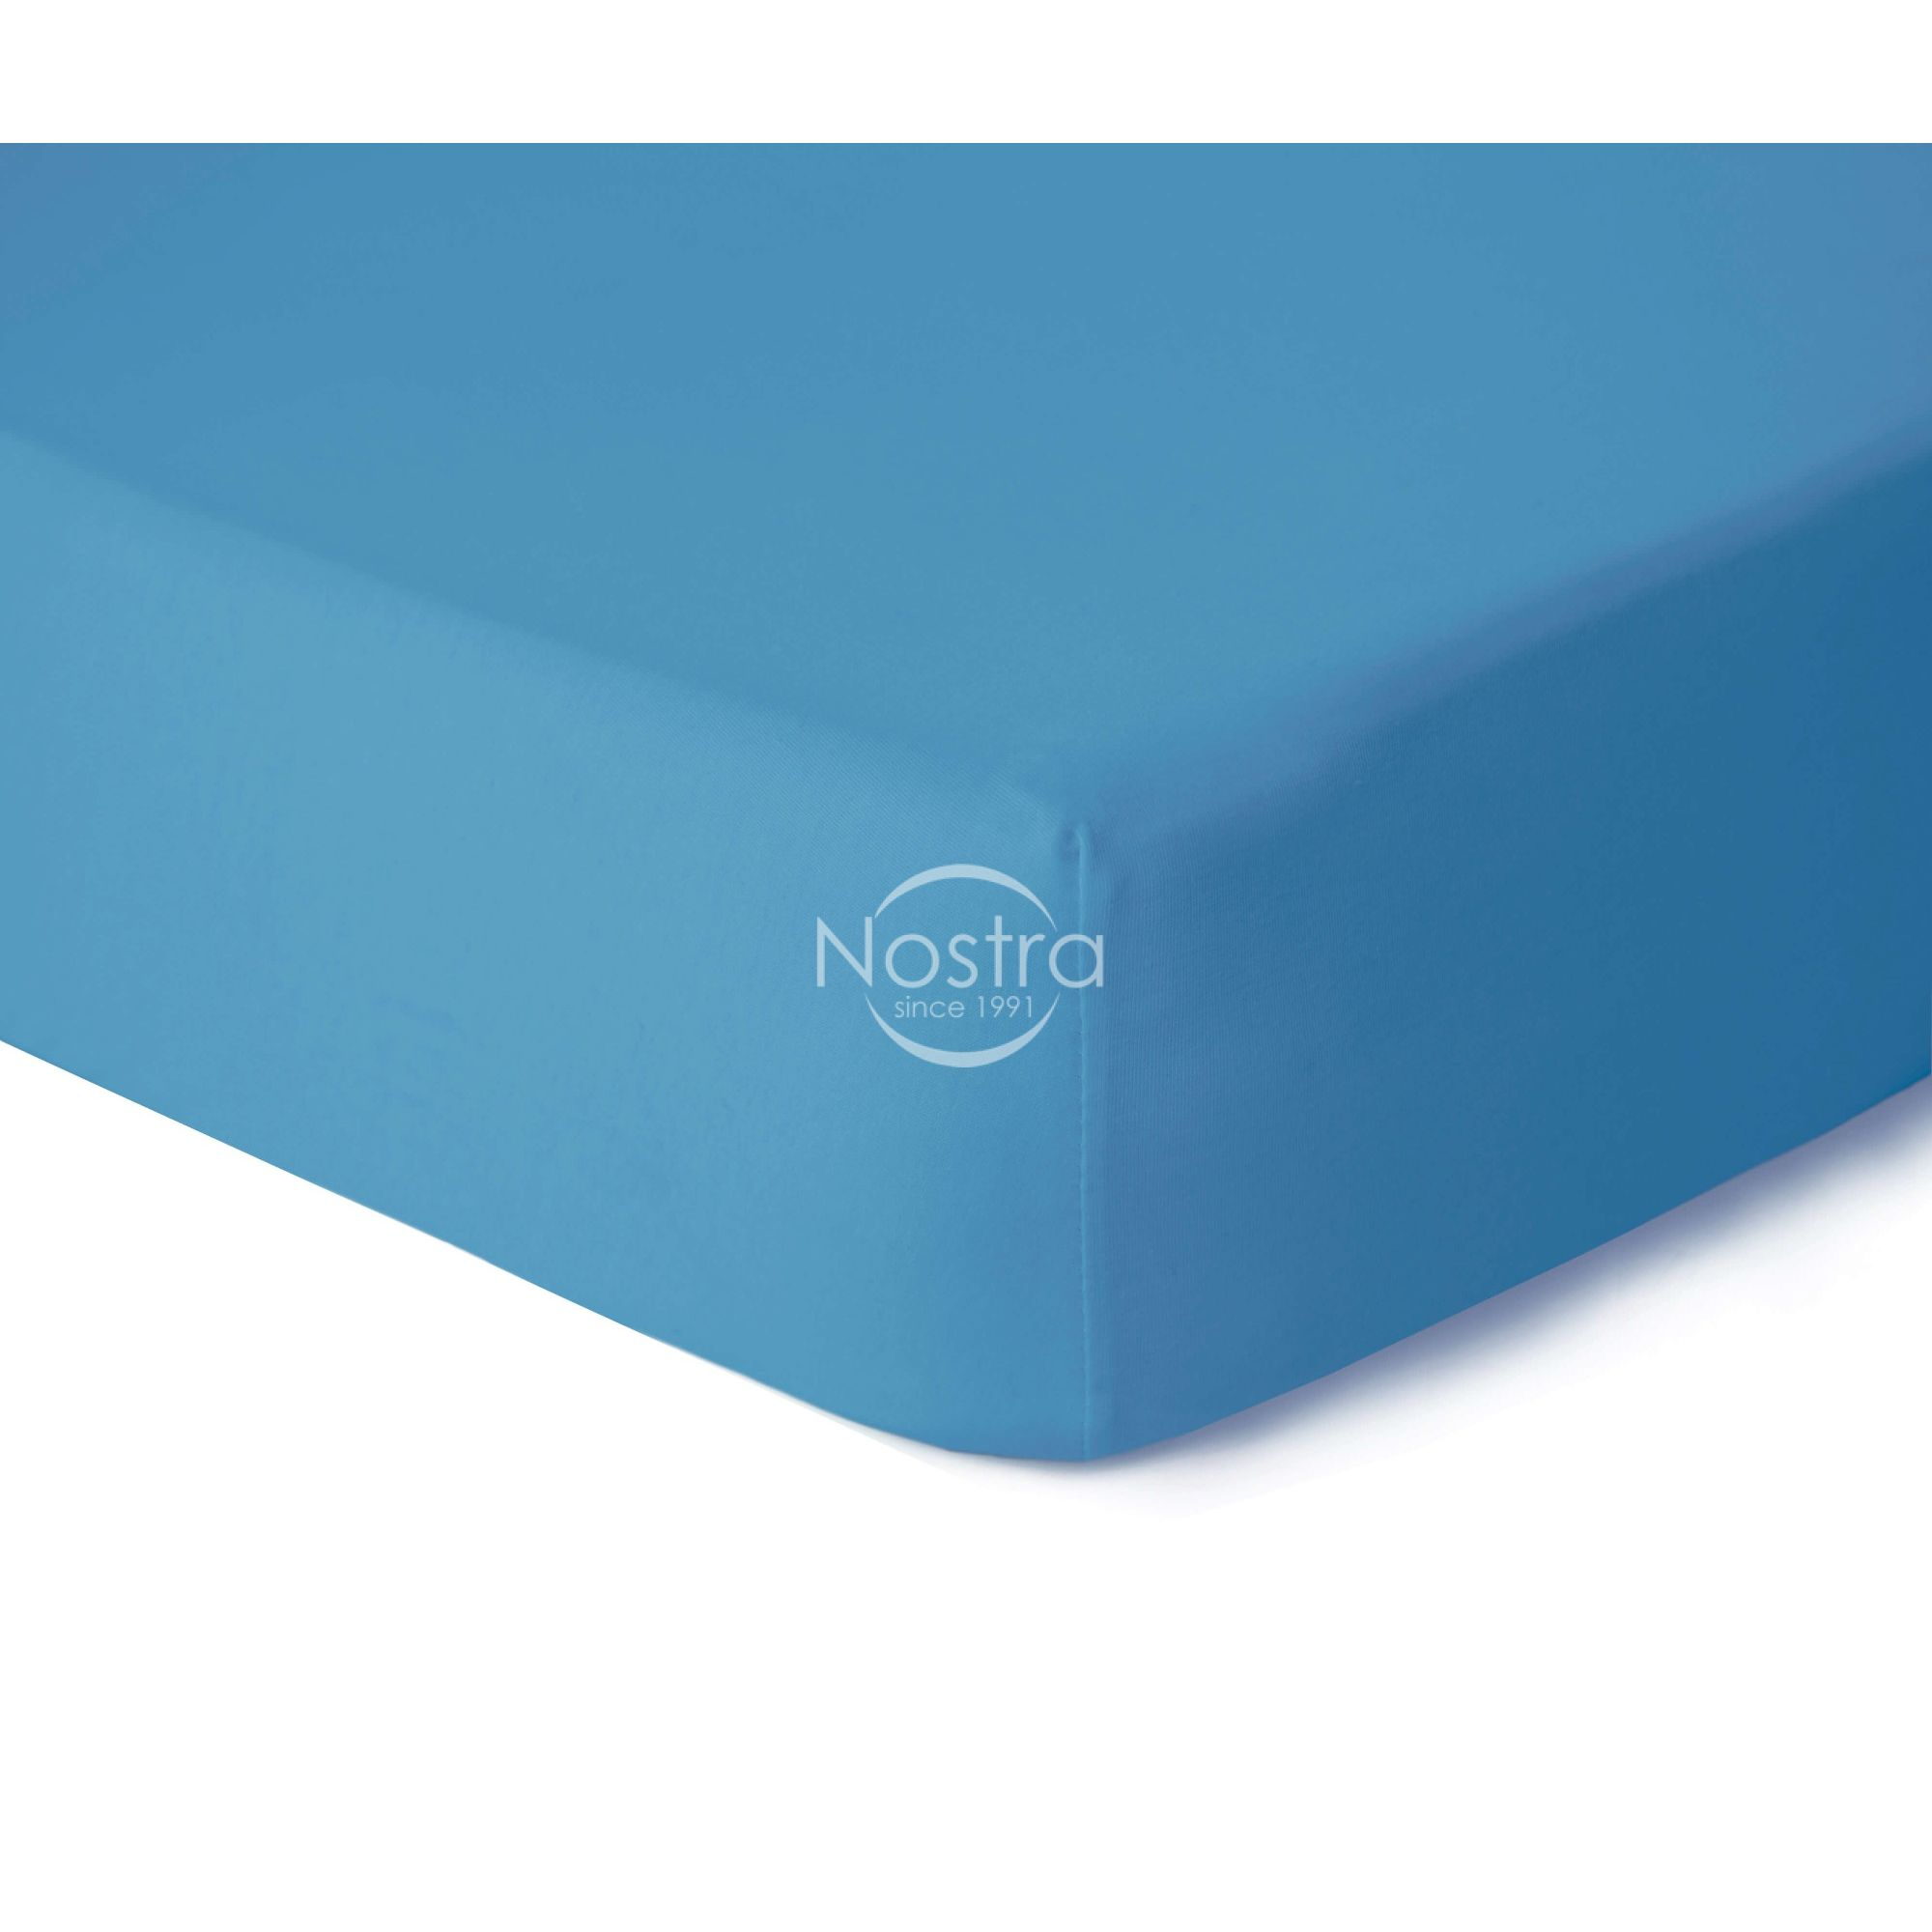 Trikotažinės paklodės su guma JERSEYBTL-ETHERAL BLUE 90x200 cm